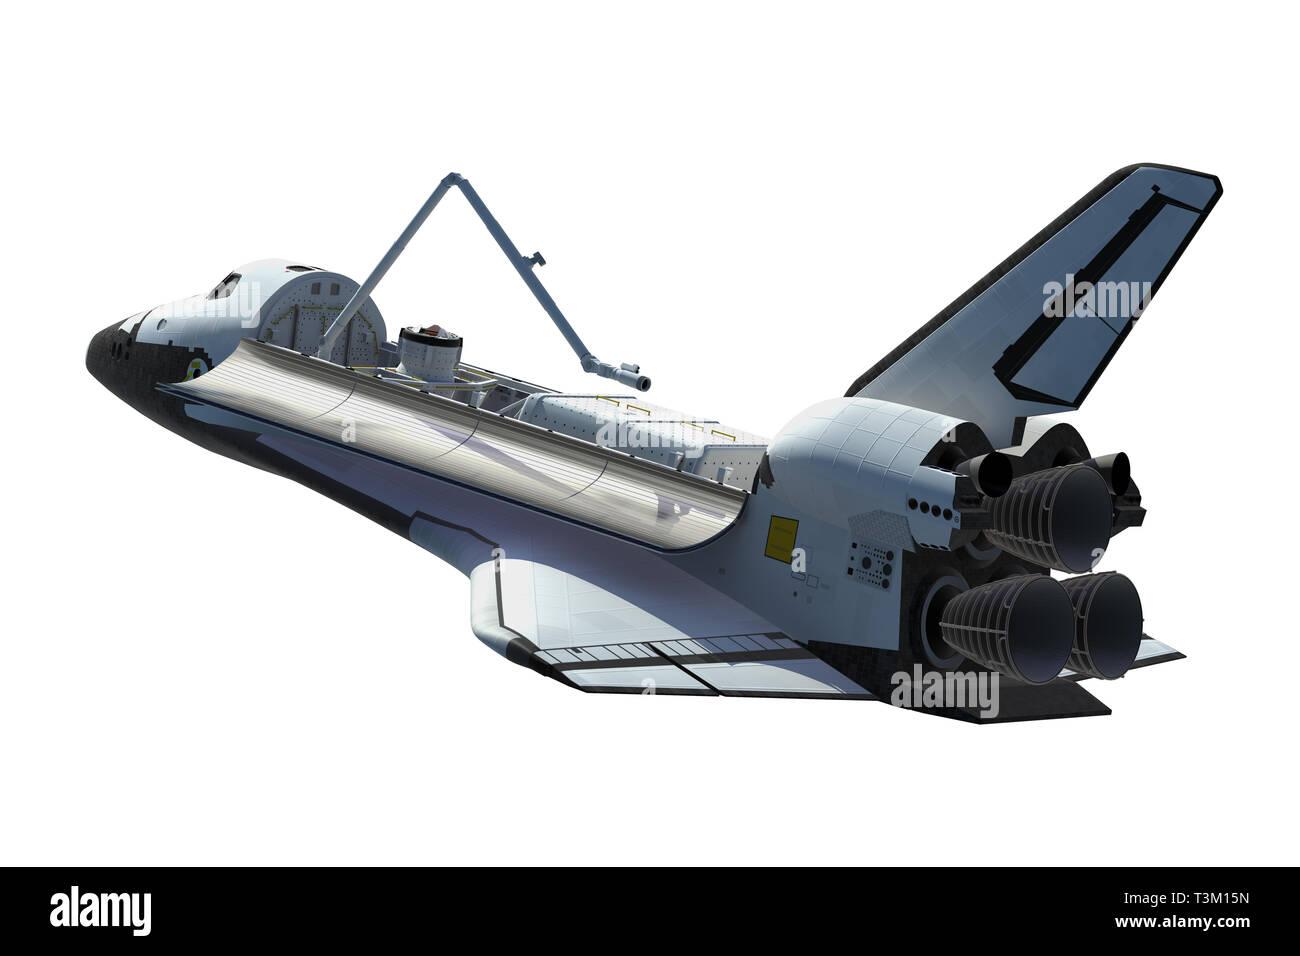 Space Shuttle Orbiter Isolated Over White Background. 3D Illustration. - Stock Image